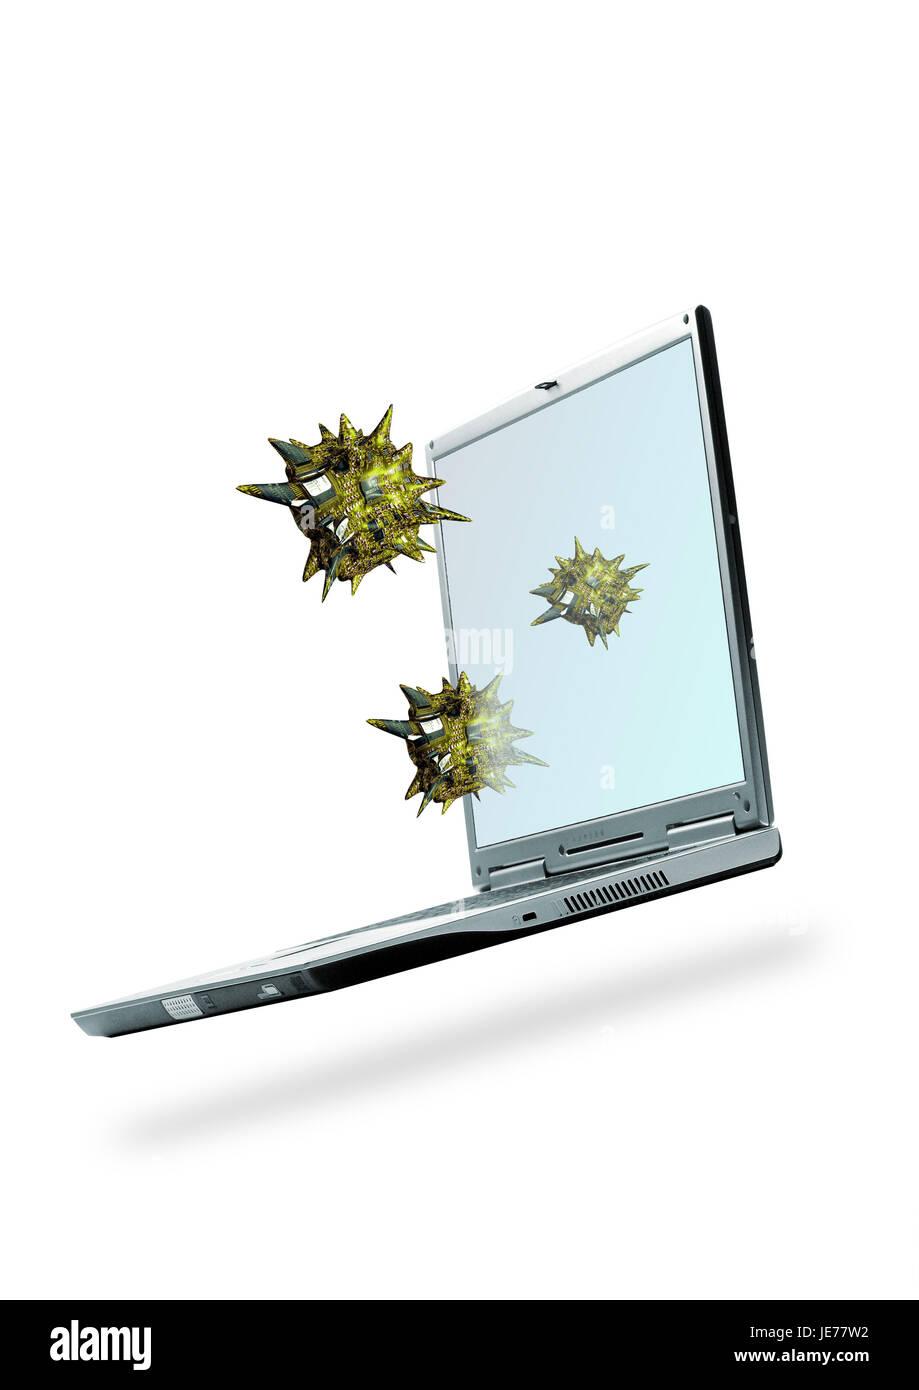 Computer viruses, laptop, - Stock Image